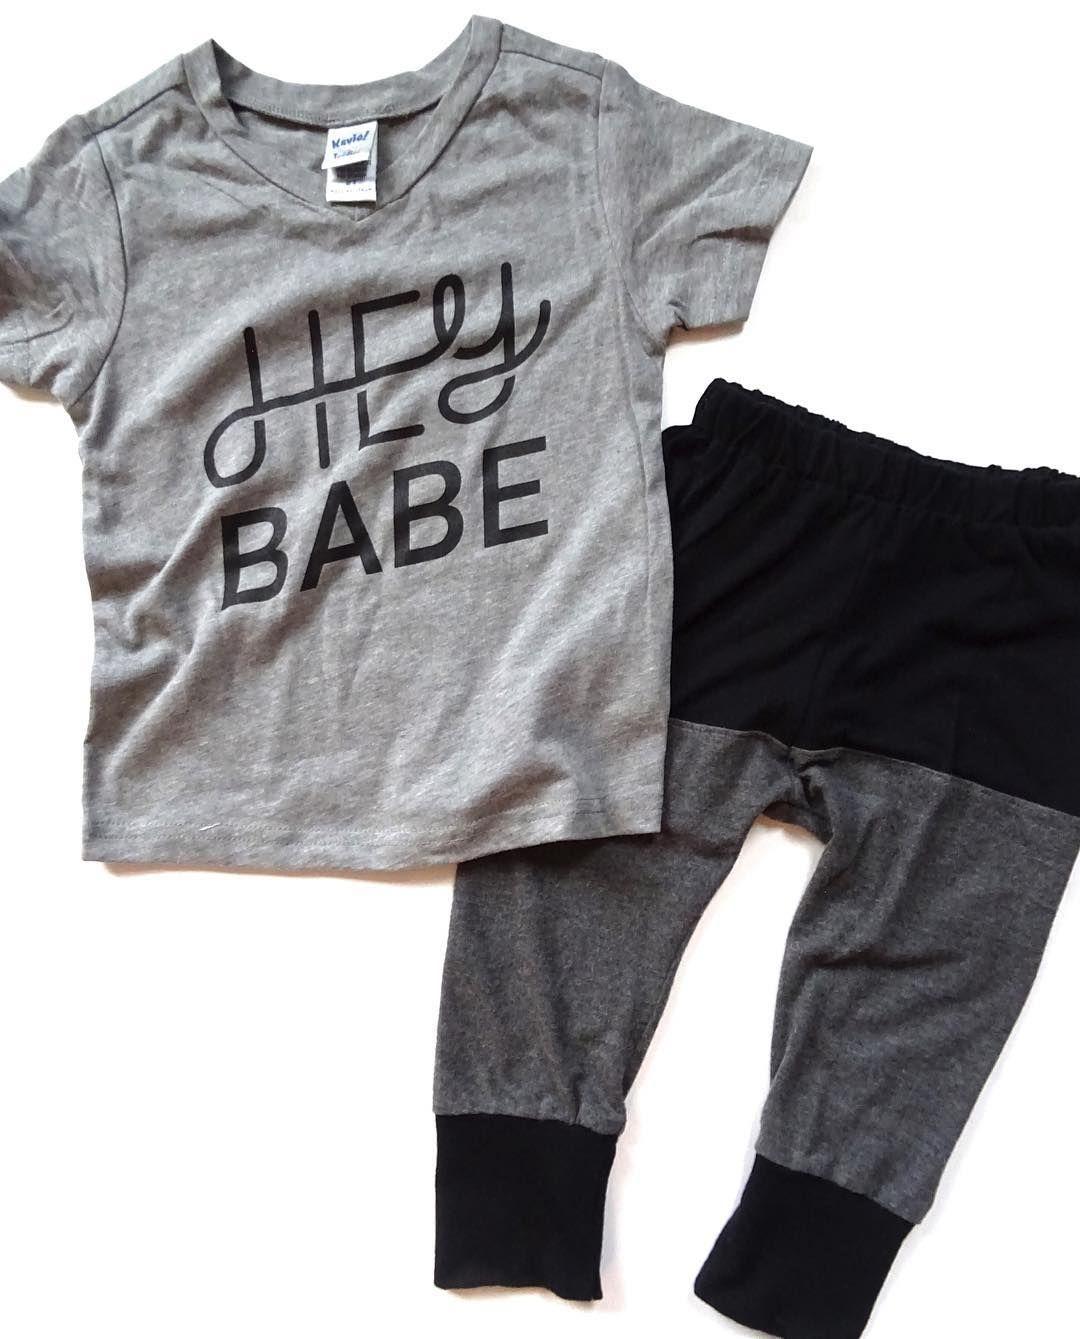 HEY BABE T-Shirt fa25722e0ac9